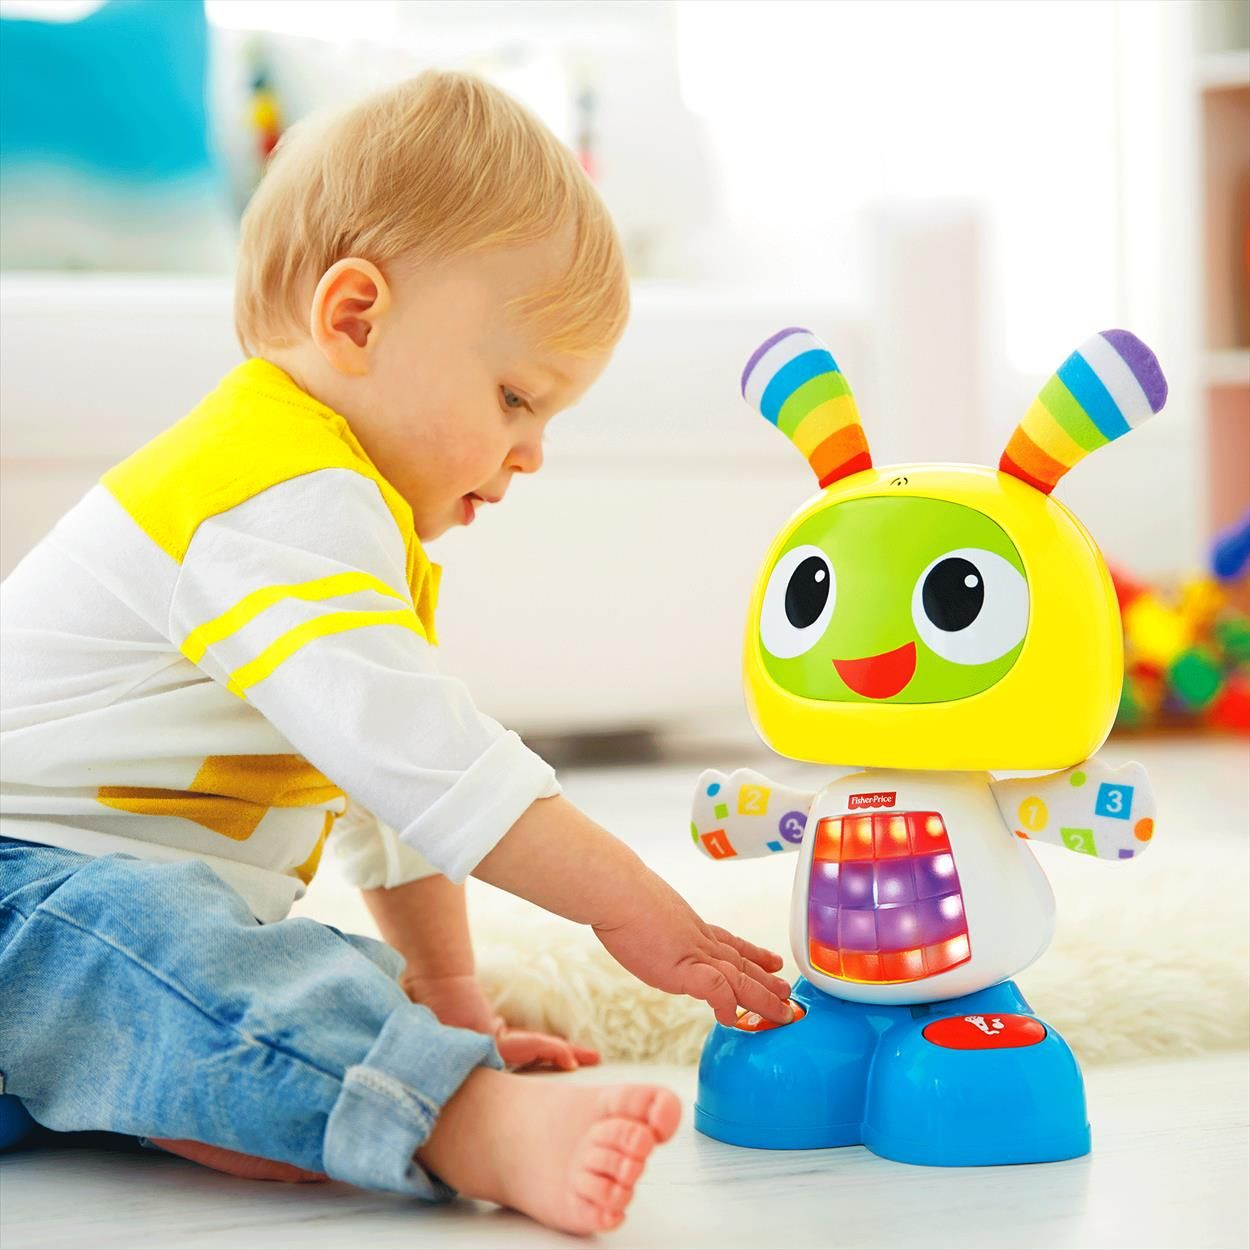 Robot Robi Juguetes Para Ninos De 1 Ano Bebe 8 Meses Y Juguetes